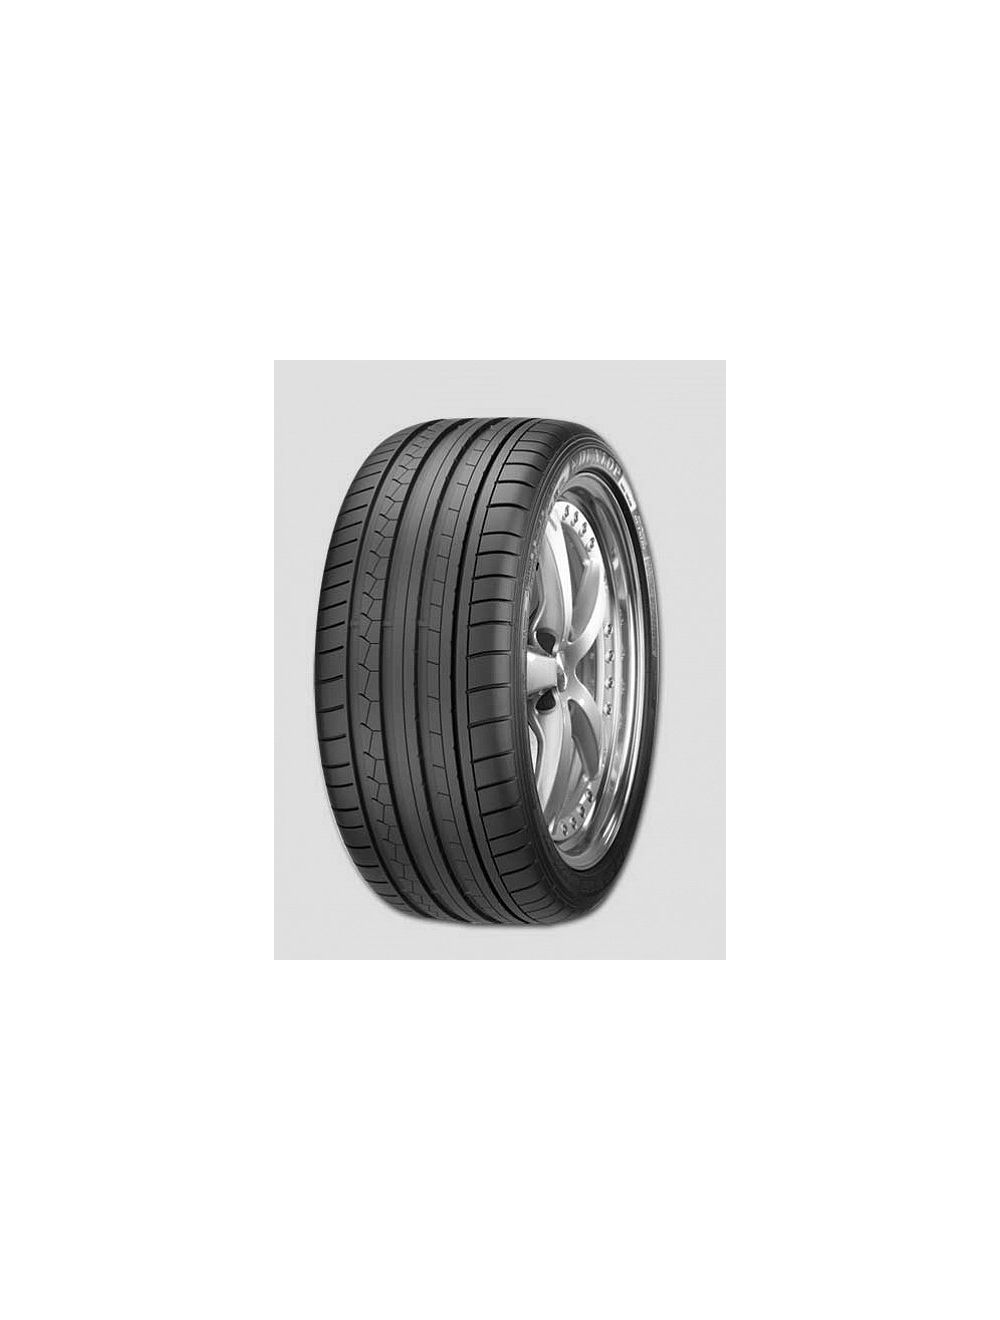 Dunlop 265/30R20 Y SP Sport Maxx GT XL RO1 Nyári gumi